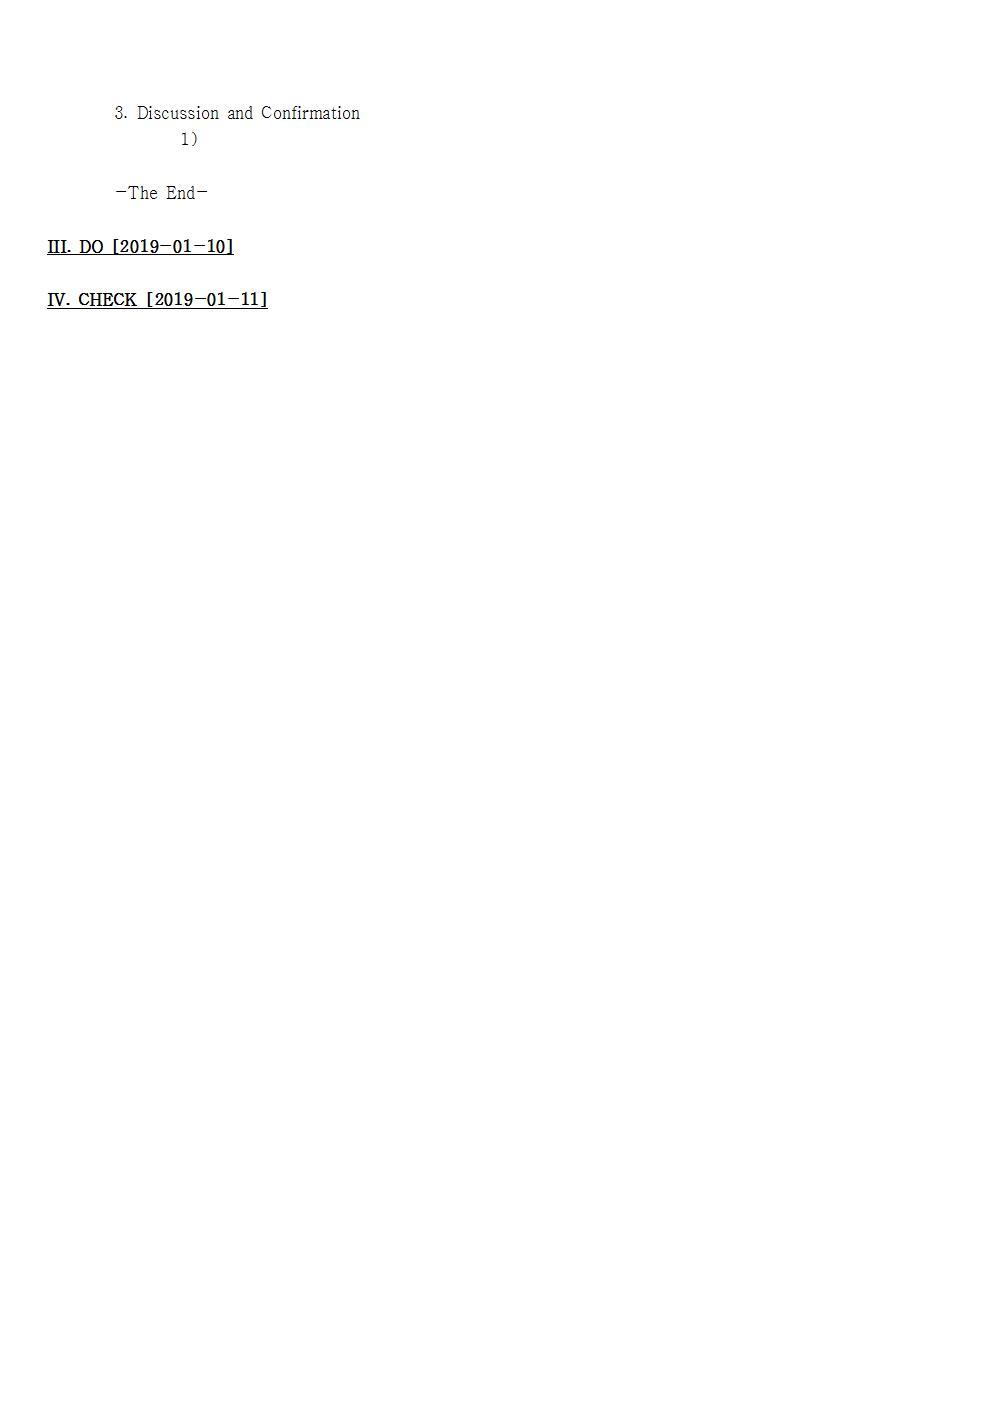 D-[19-002-RD-02]-[PRISM2.X-ADOxx]-[2019-01-08]-[MR]002.jpg